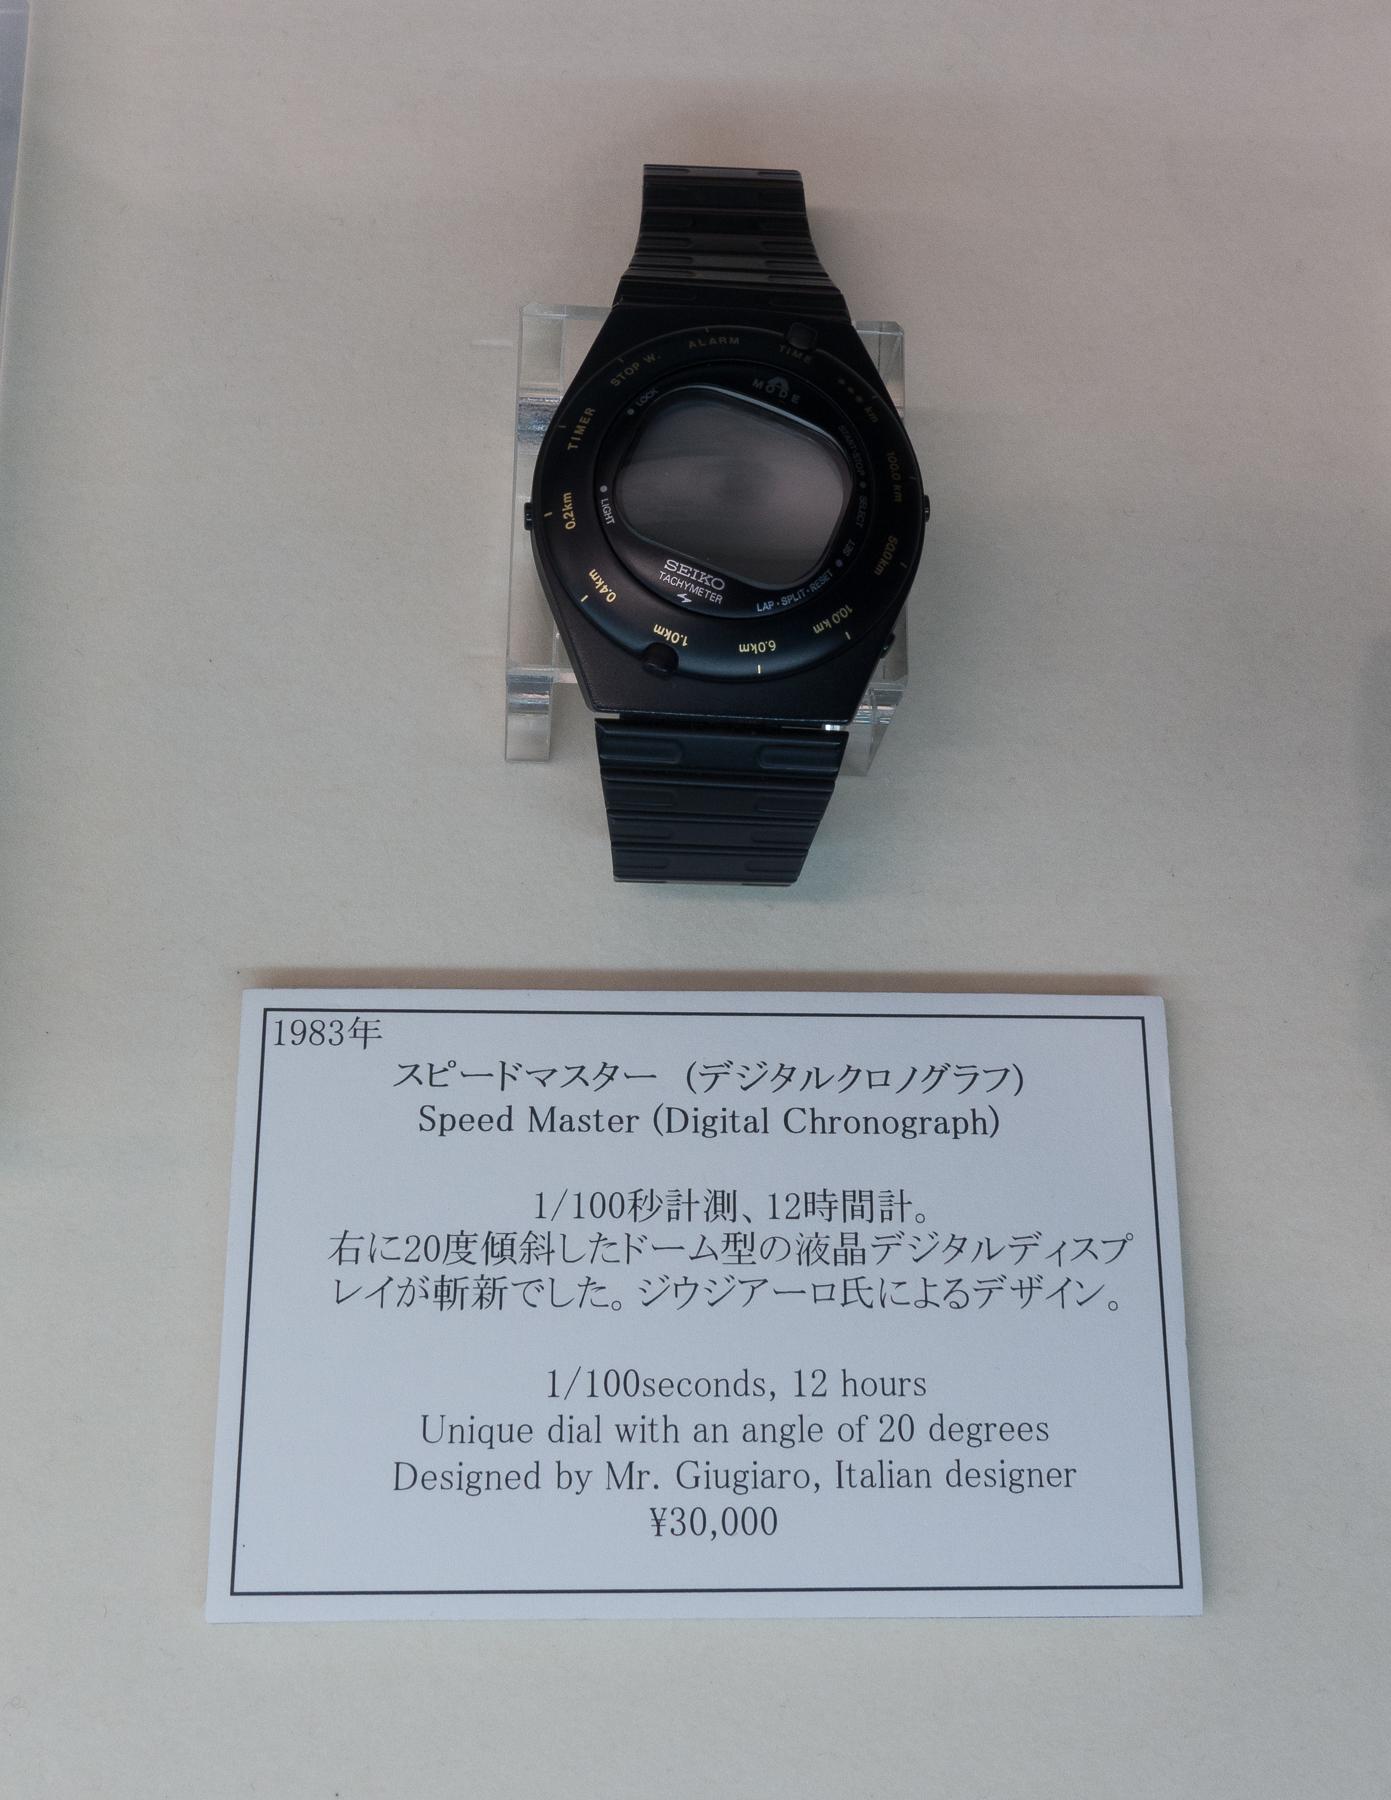 A828 Giugiaro Digital Speed Master